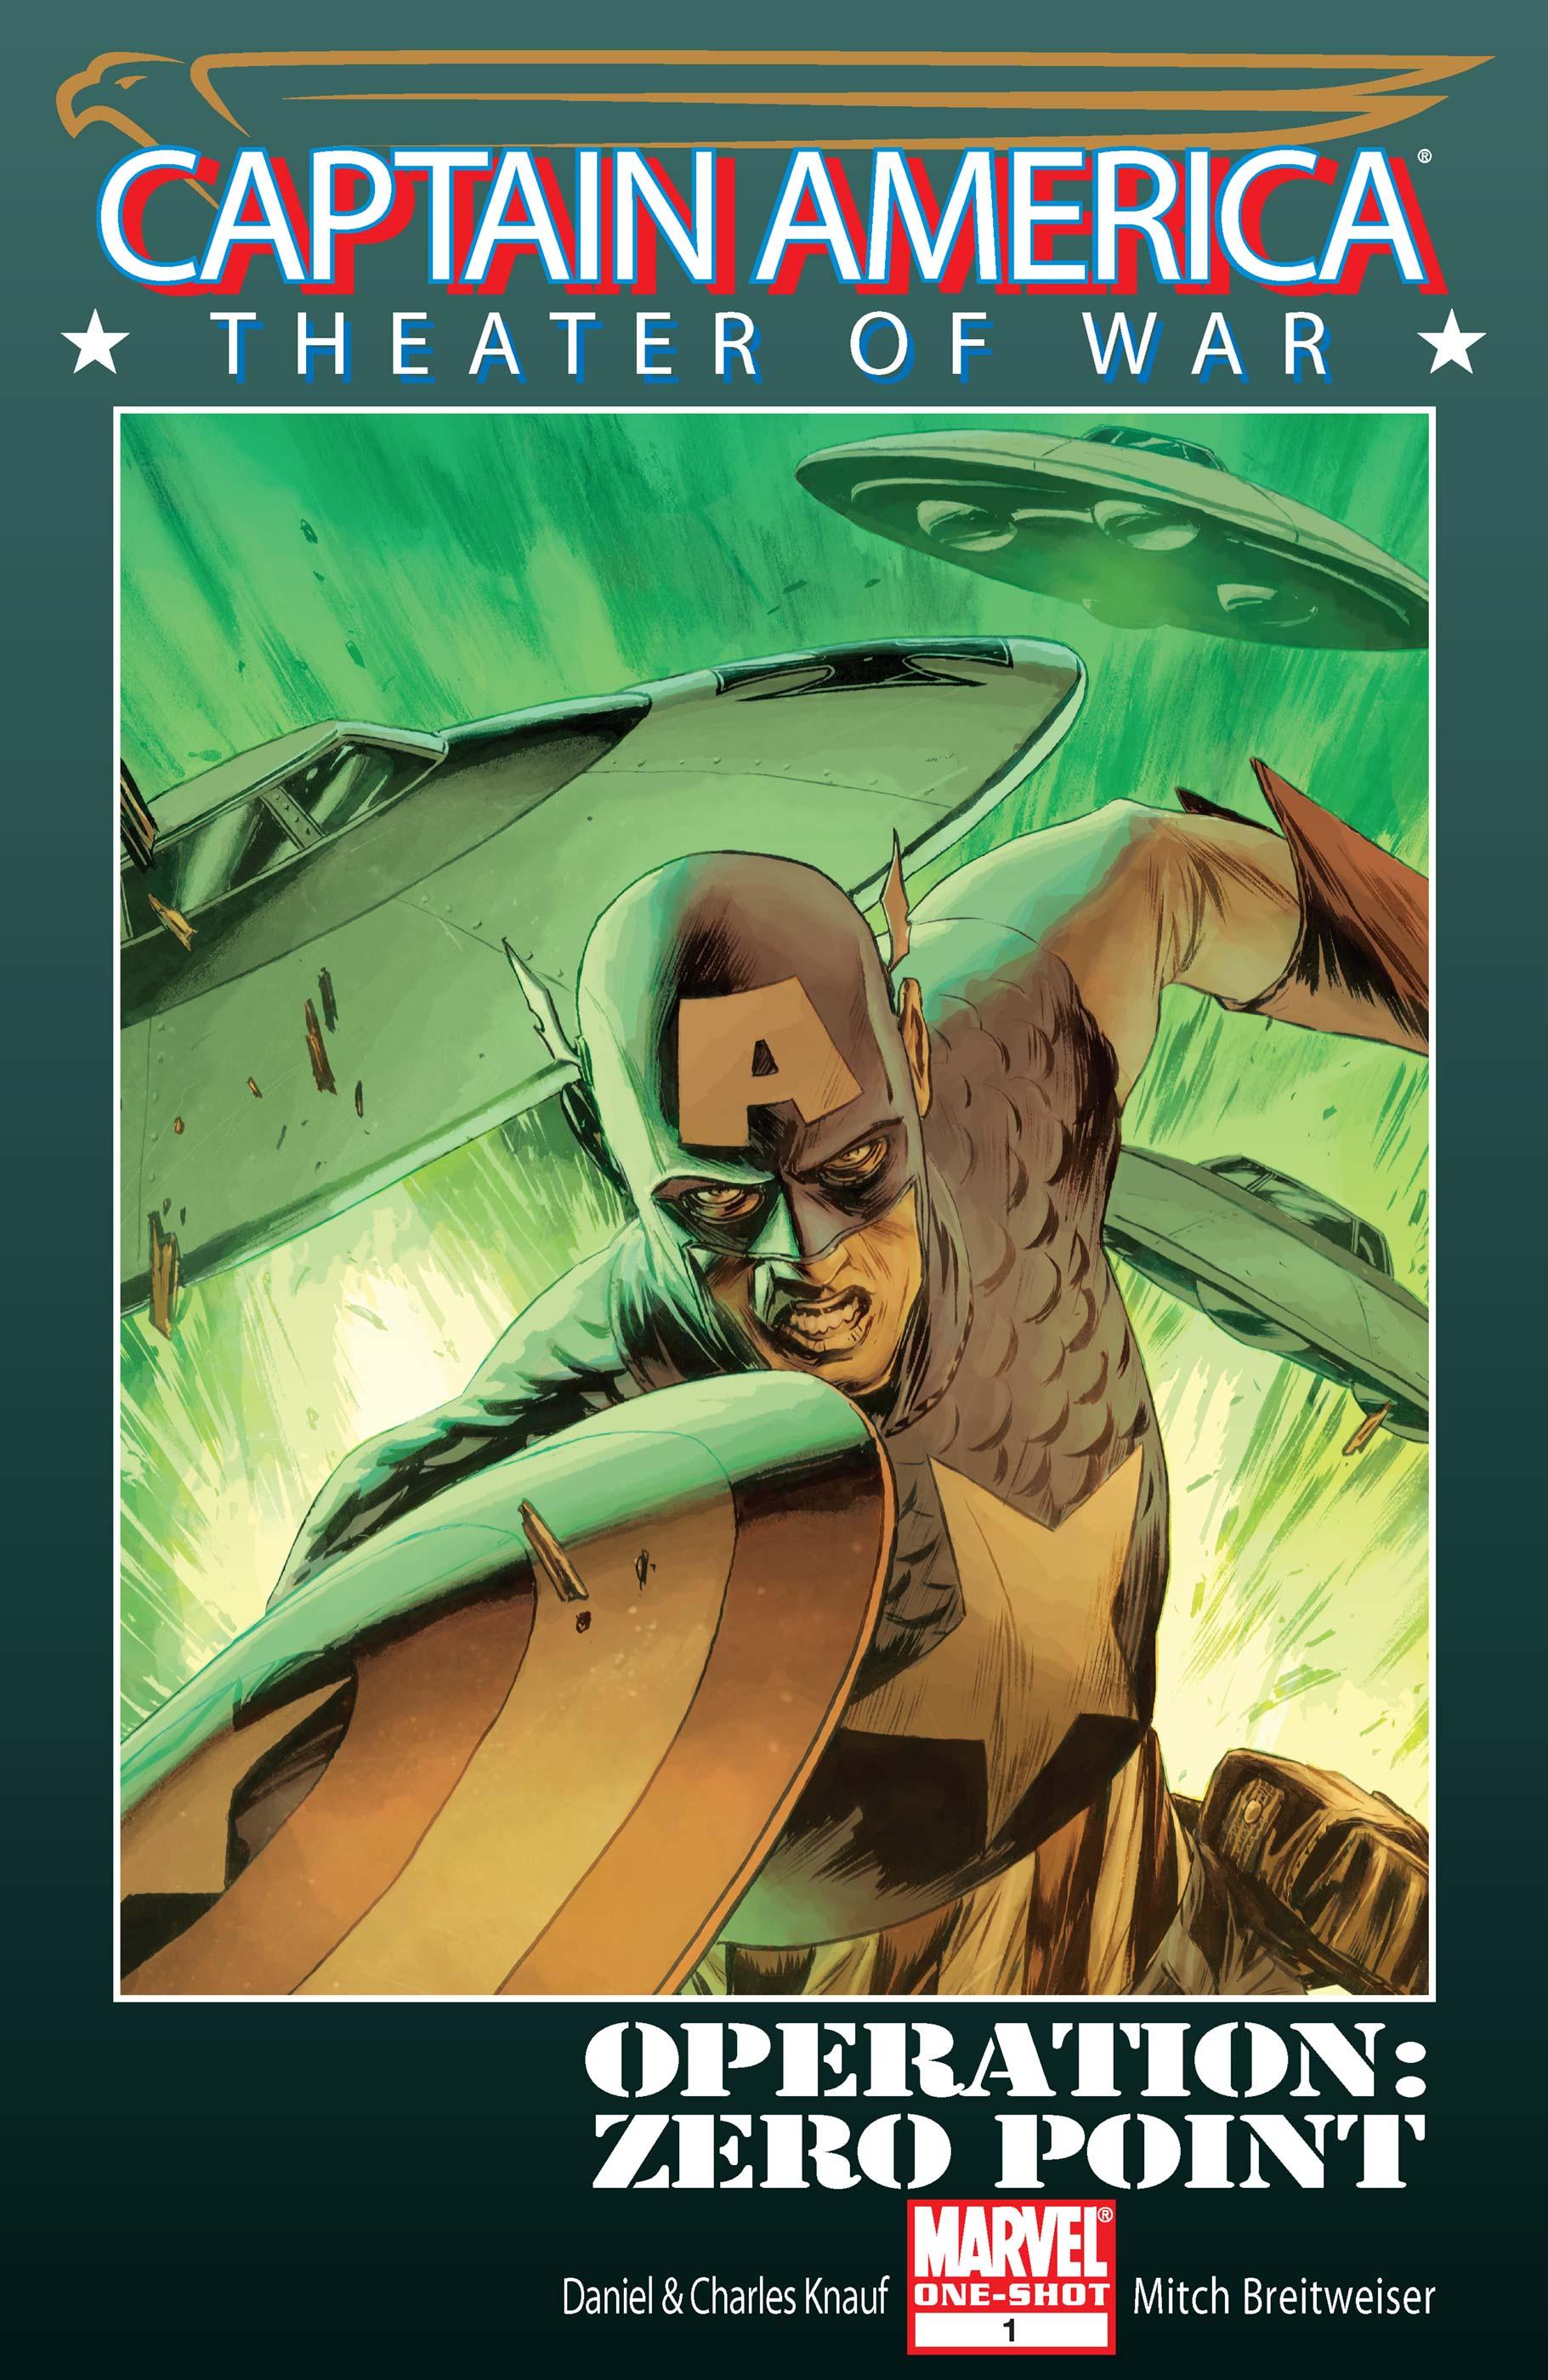 Captain America Theater of War: Operation Zero-Point (2008) #1